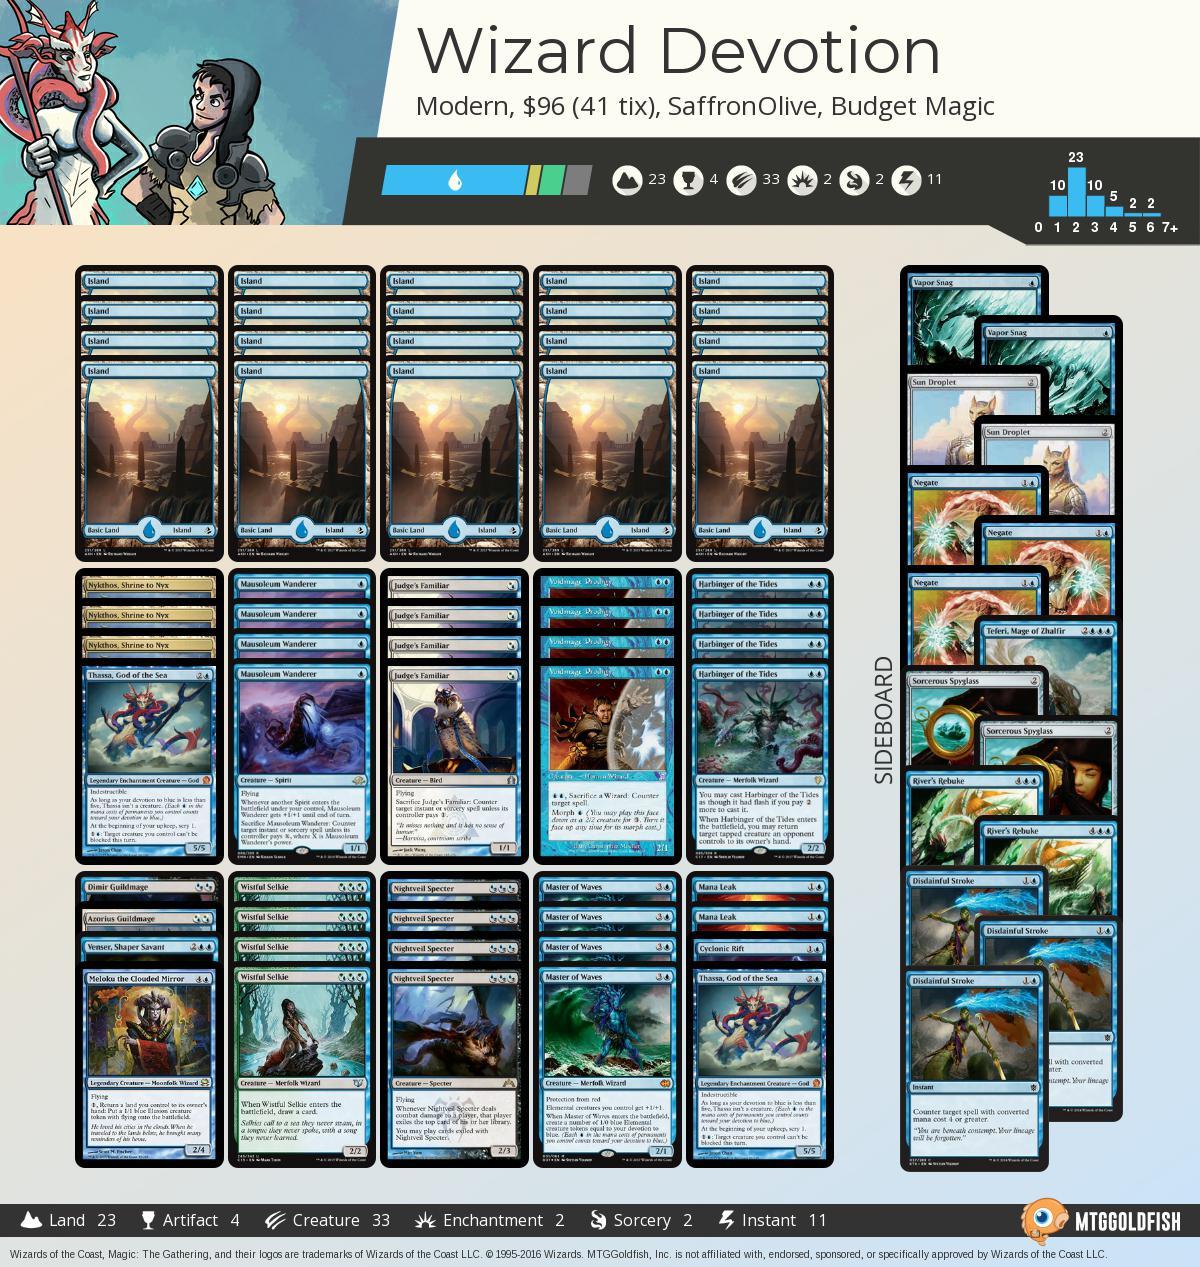 Wizard%2bdevotion 23c94428 6ca9 4e16 a29f ead66c7dedfc%2ejpg